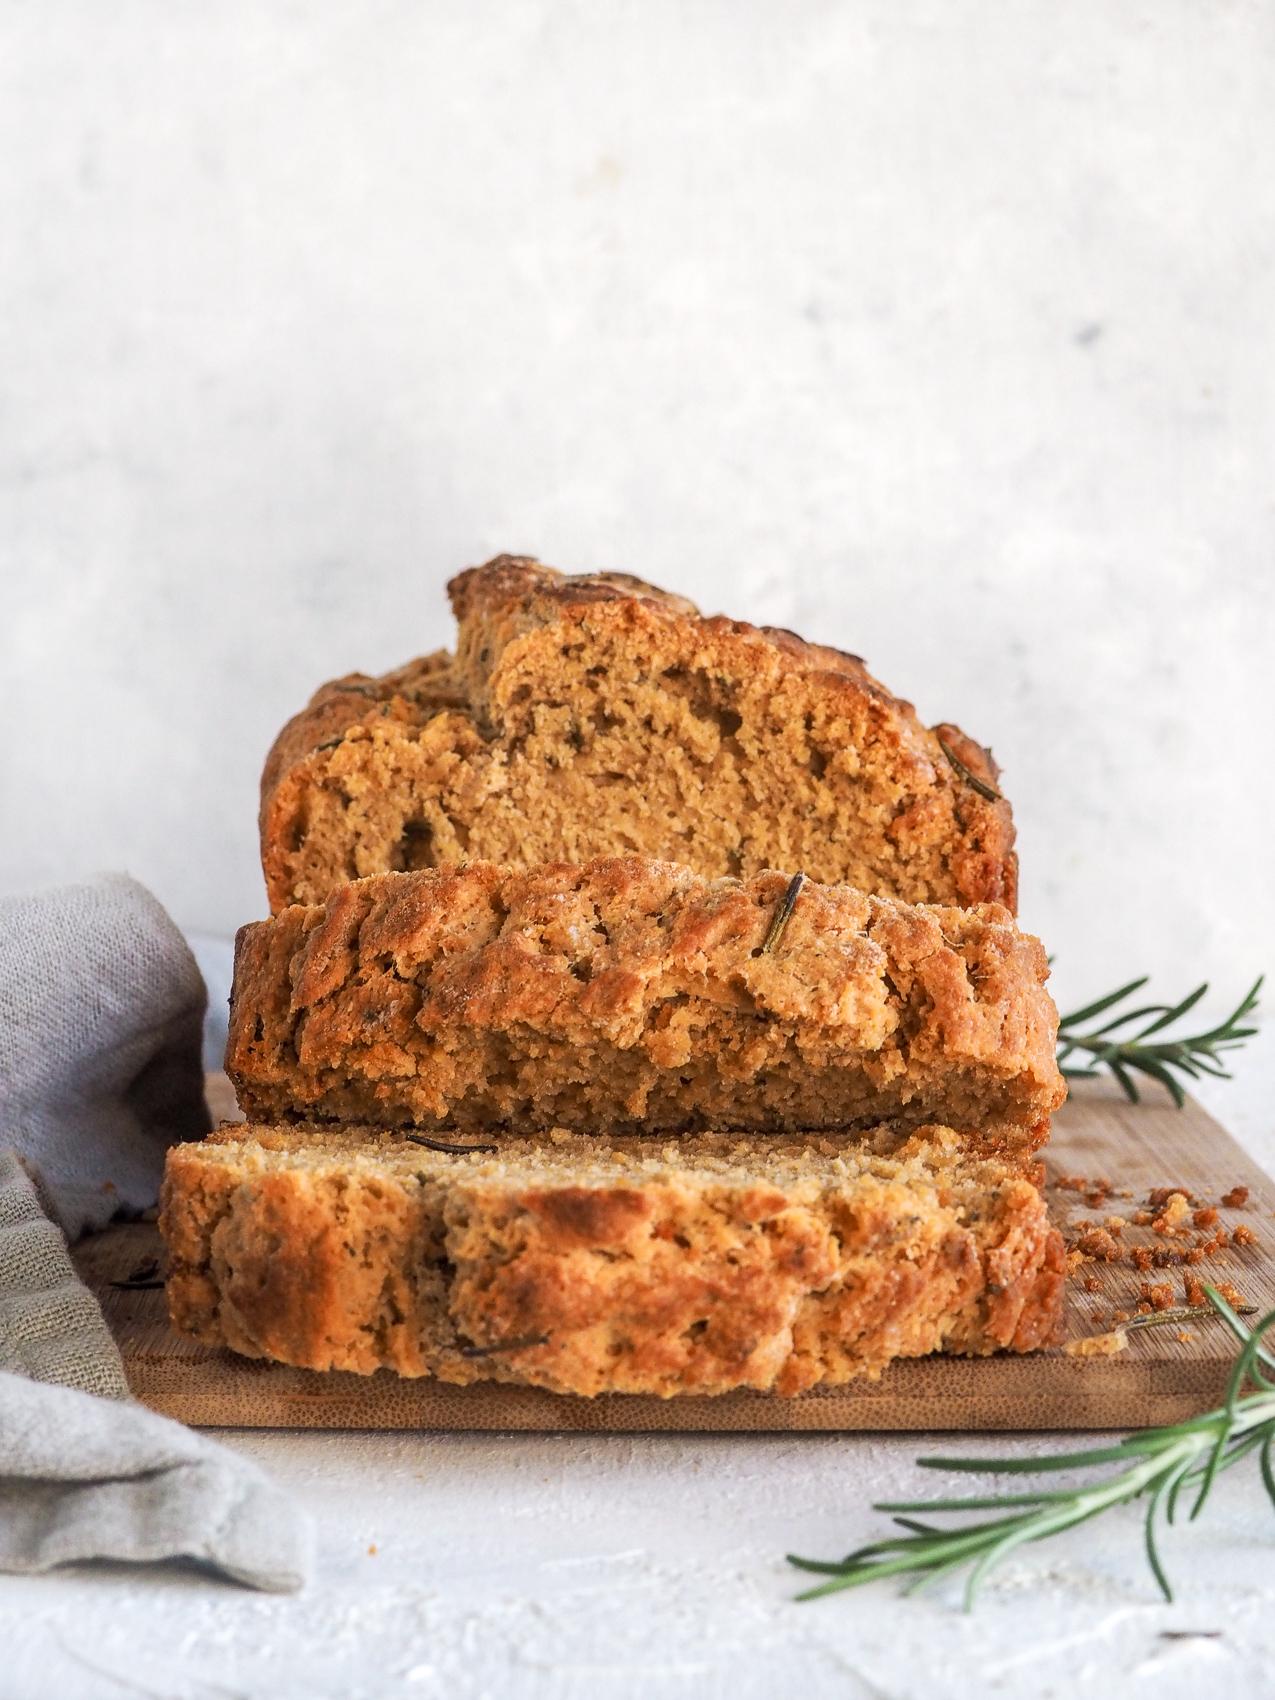 loaf of rosemary garlic beer bread on a wood cutting board